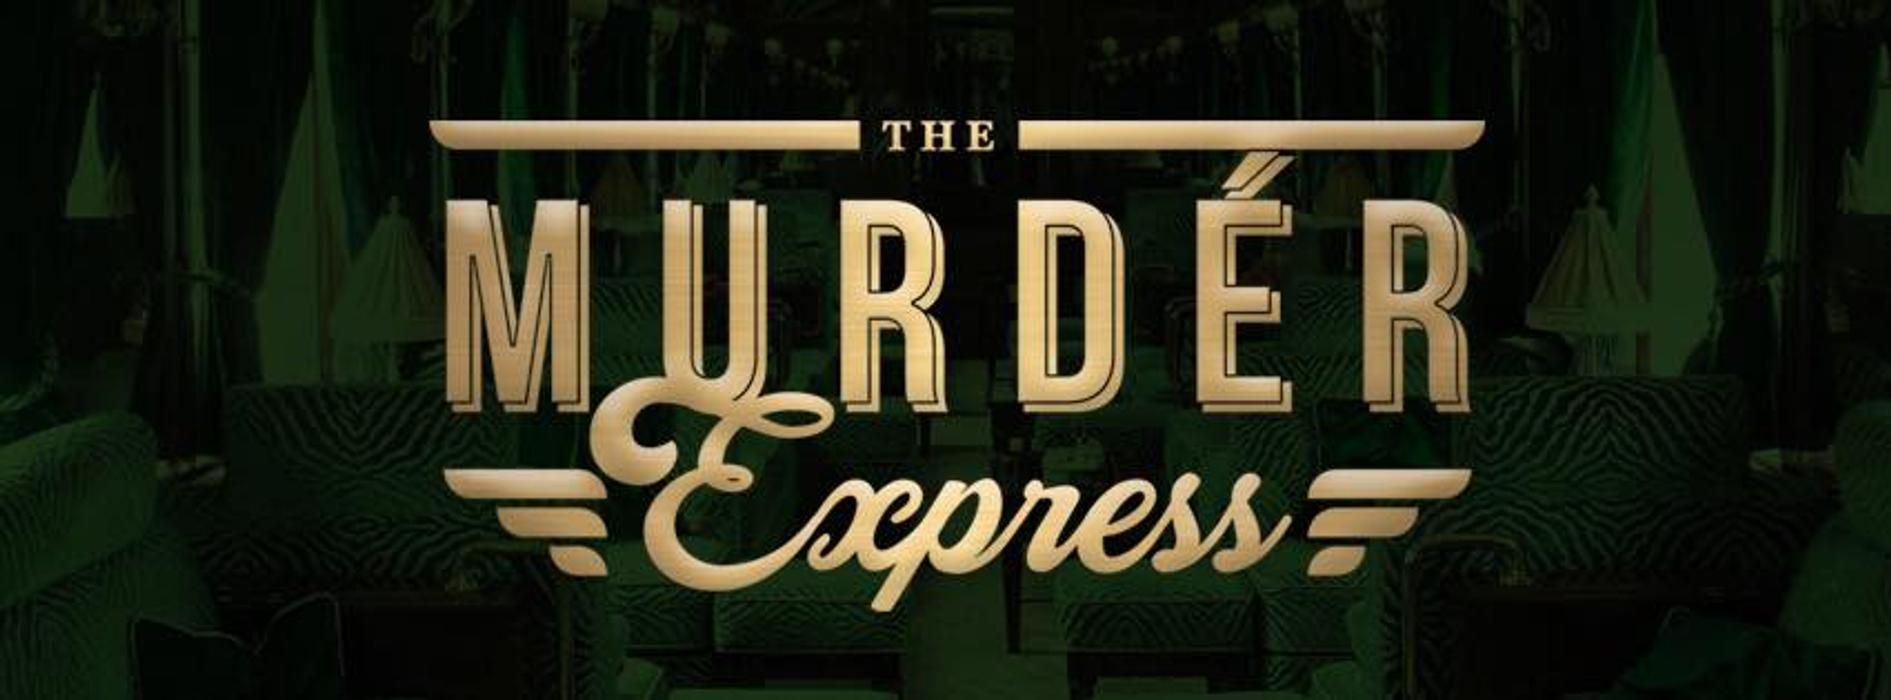 The Murdér Express's event image